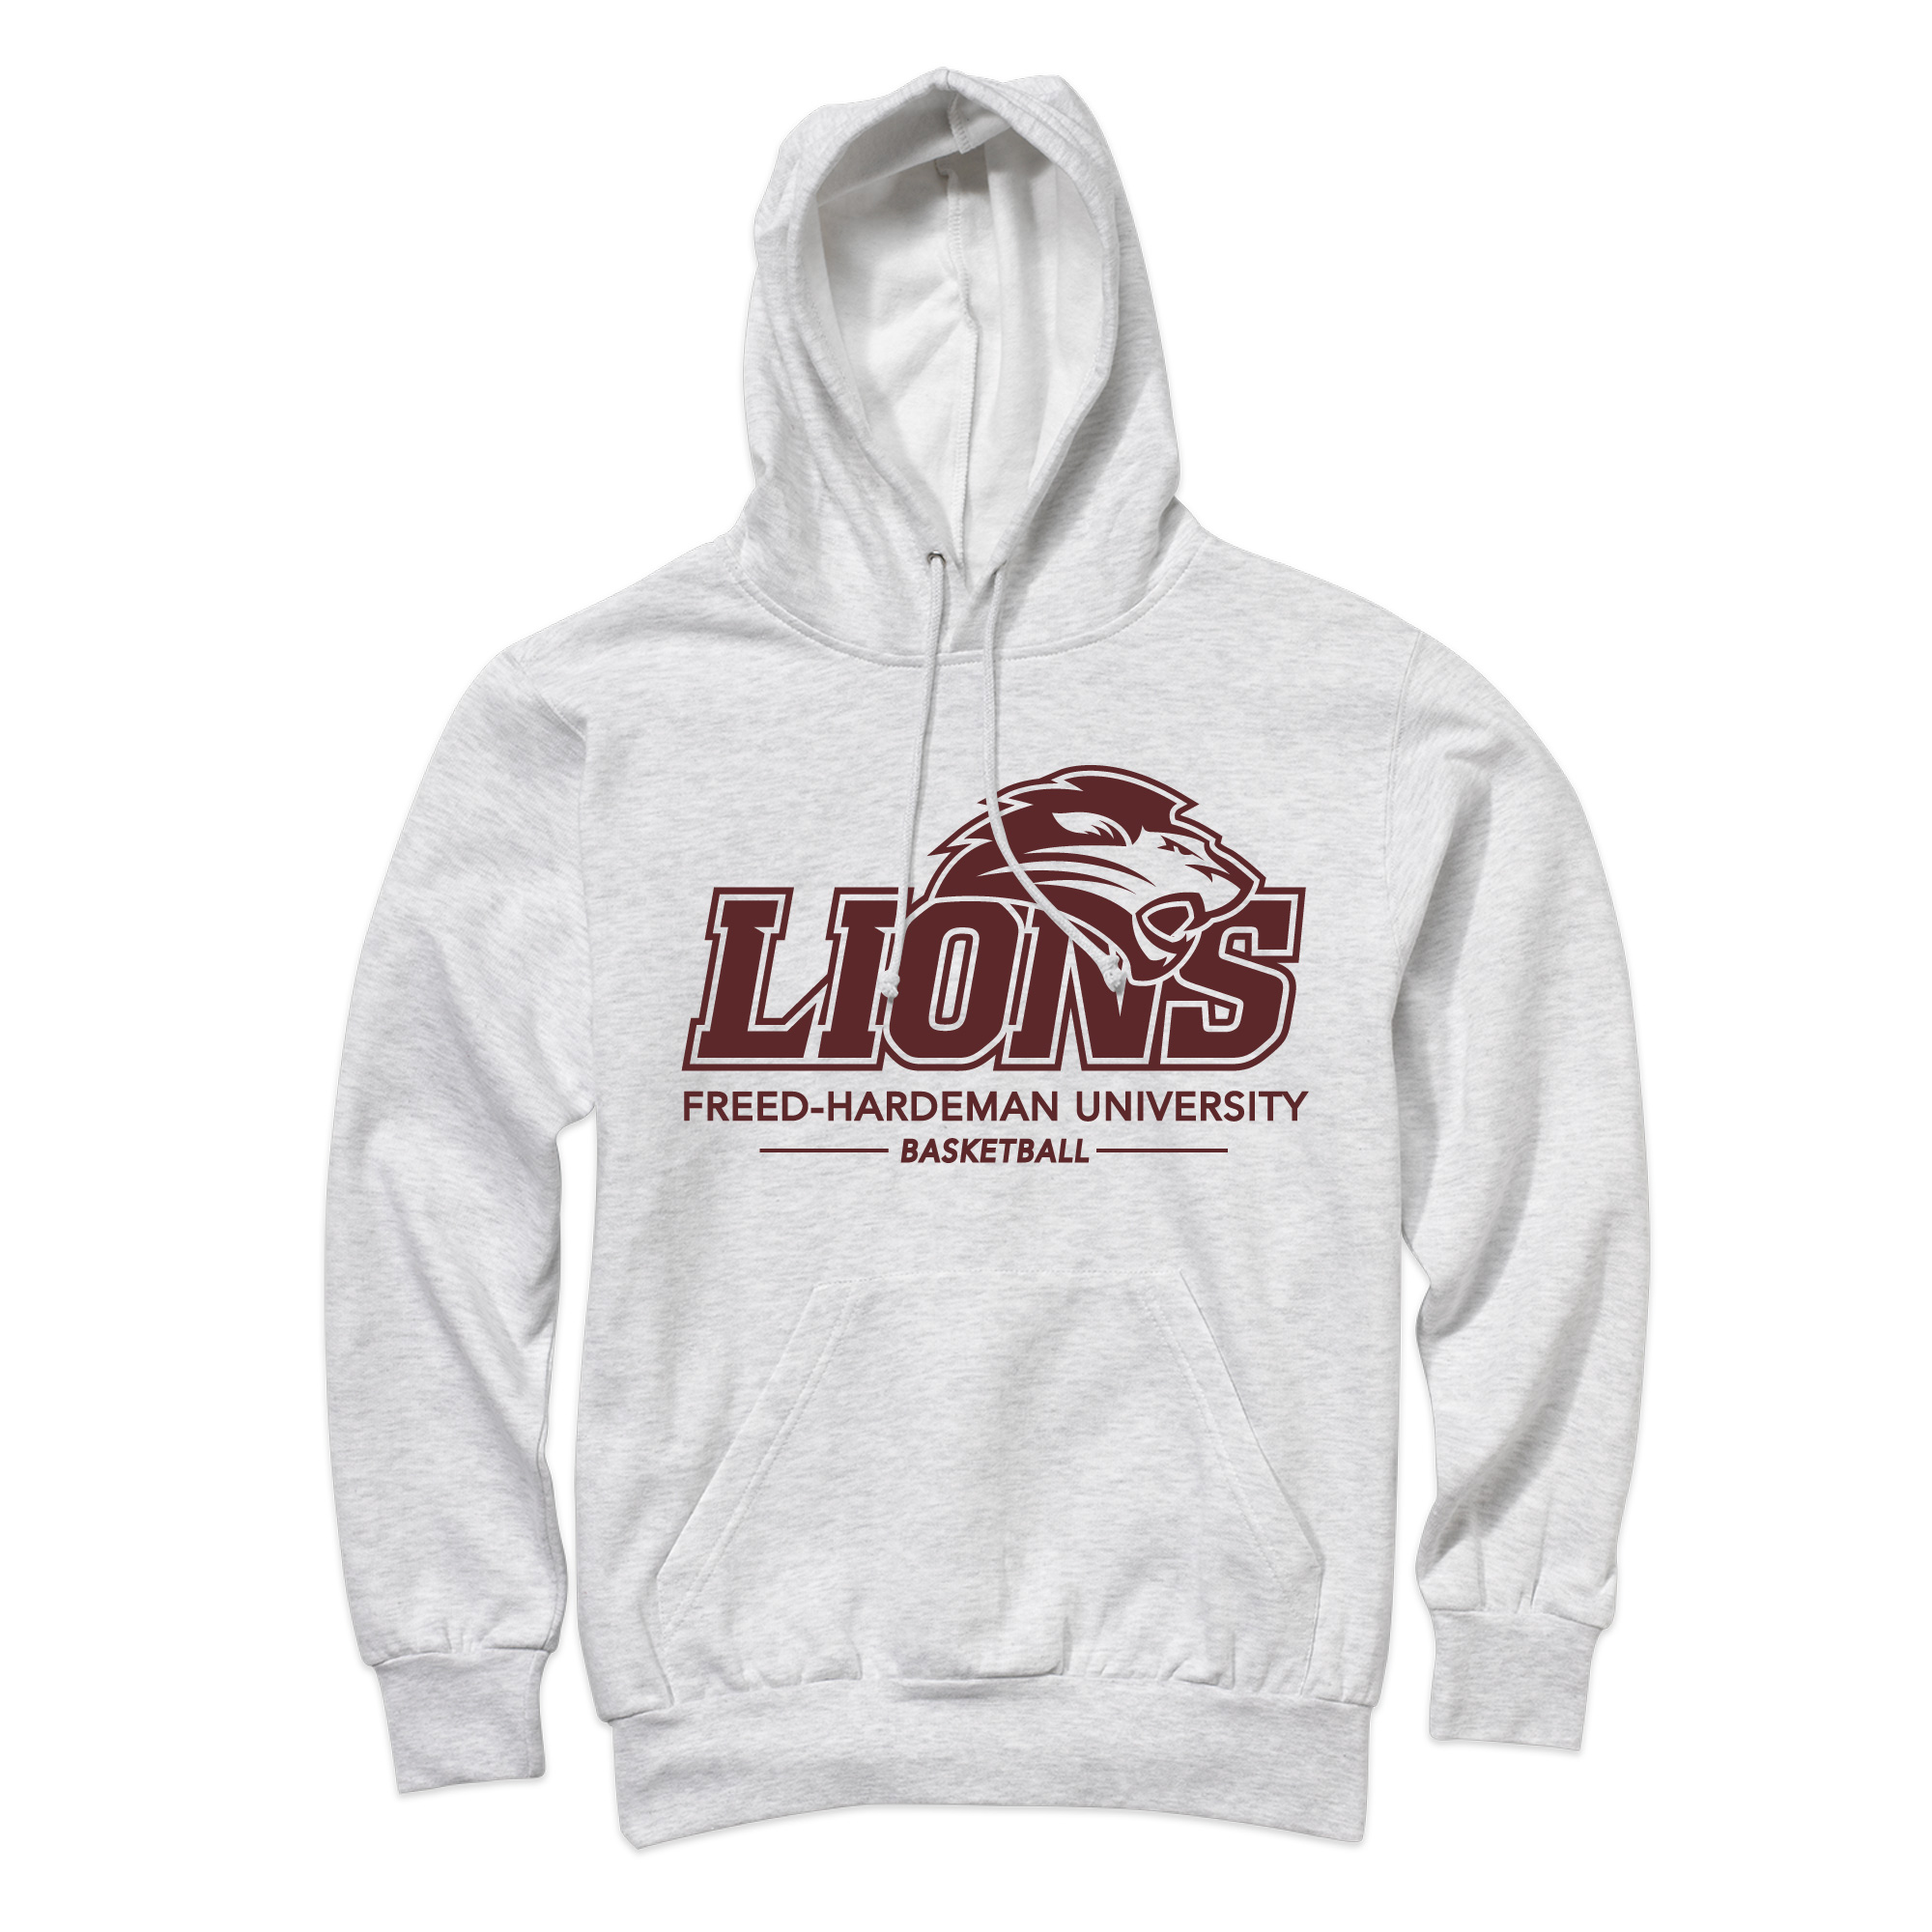 Lions Basketball Hoodie